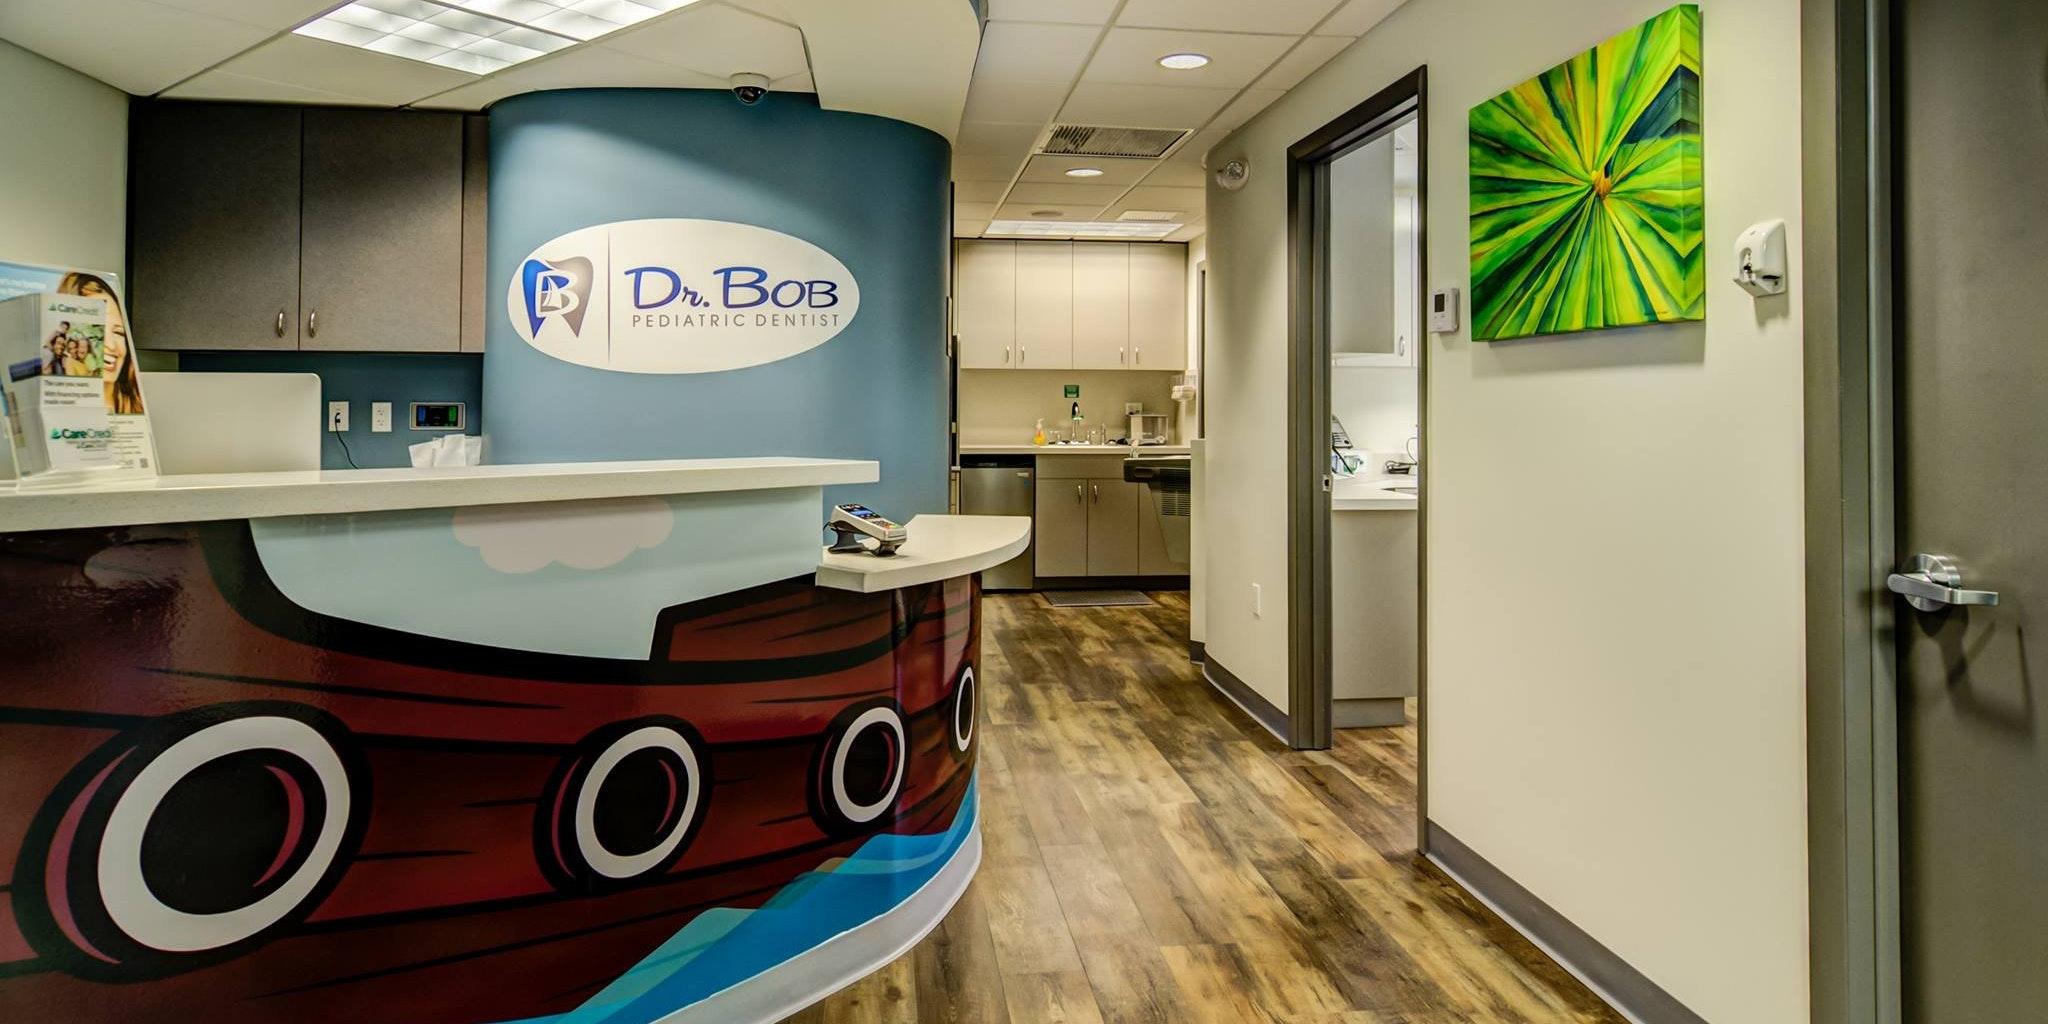 Dr. Bob Pediatric Dentist